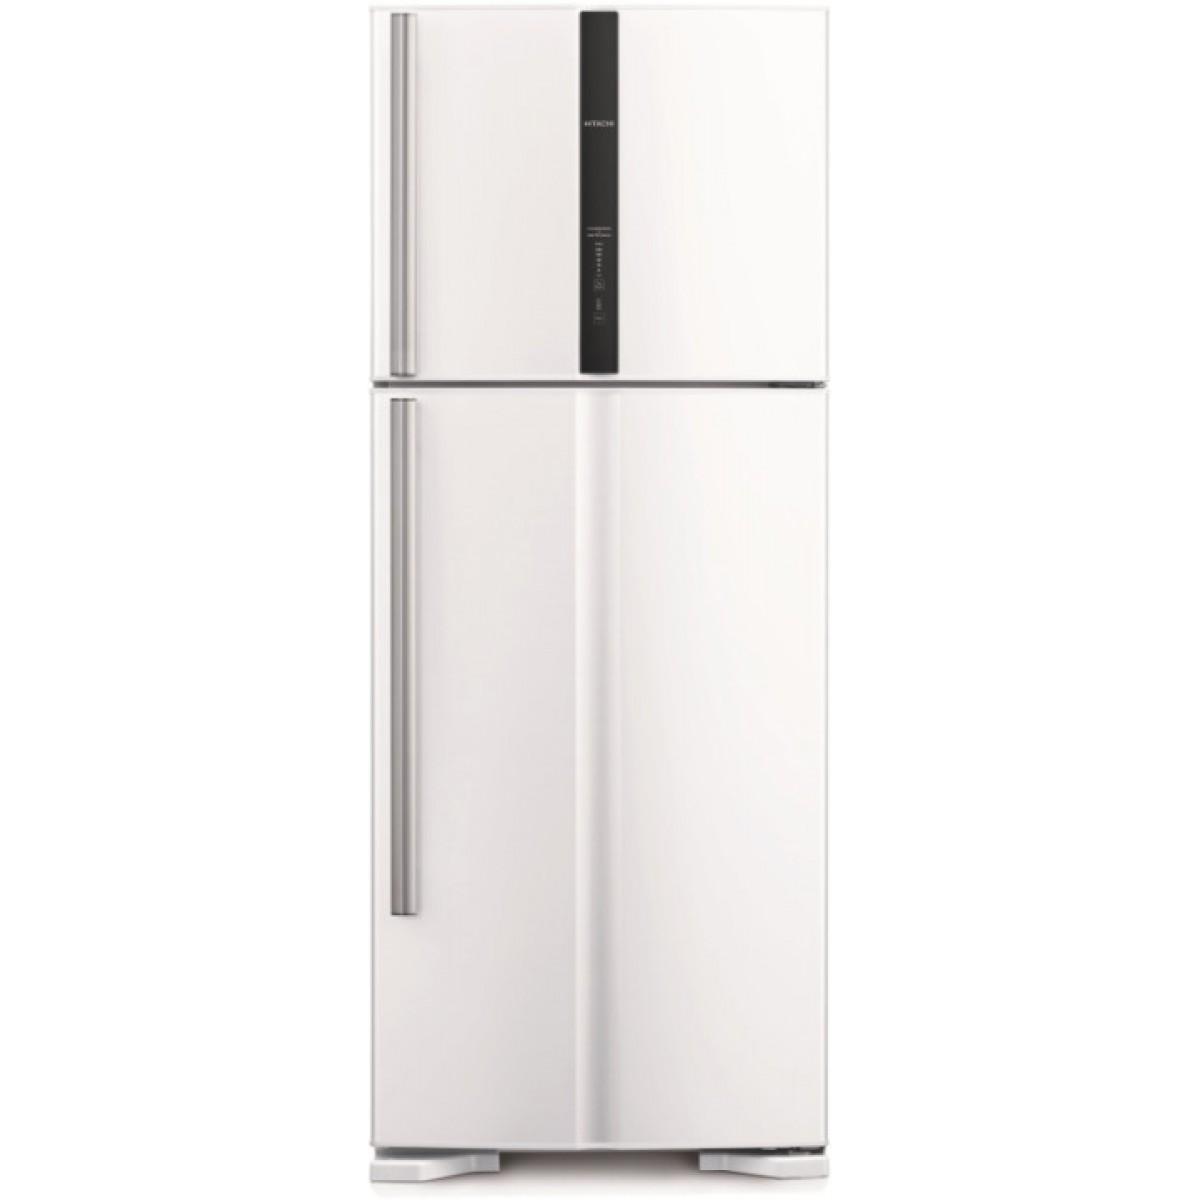 Hitachi R-V540PRU3 (PWH) Λευκές Συσκευές Ηλεκτρικες Συσκευες - homeelectrics.gr